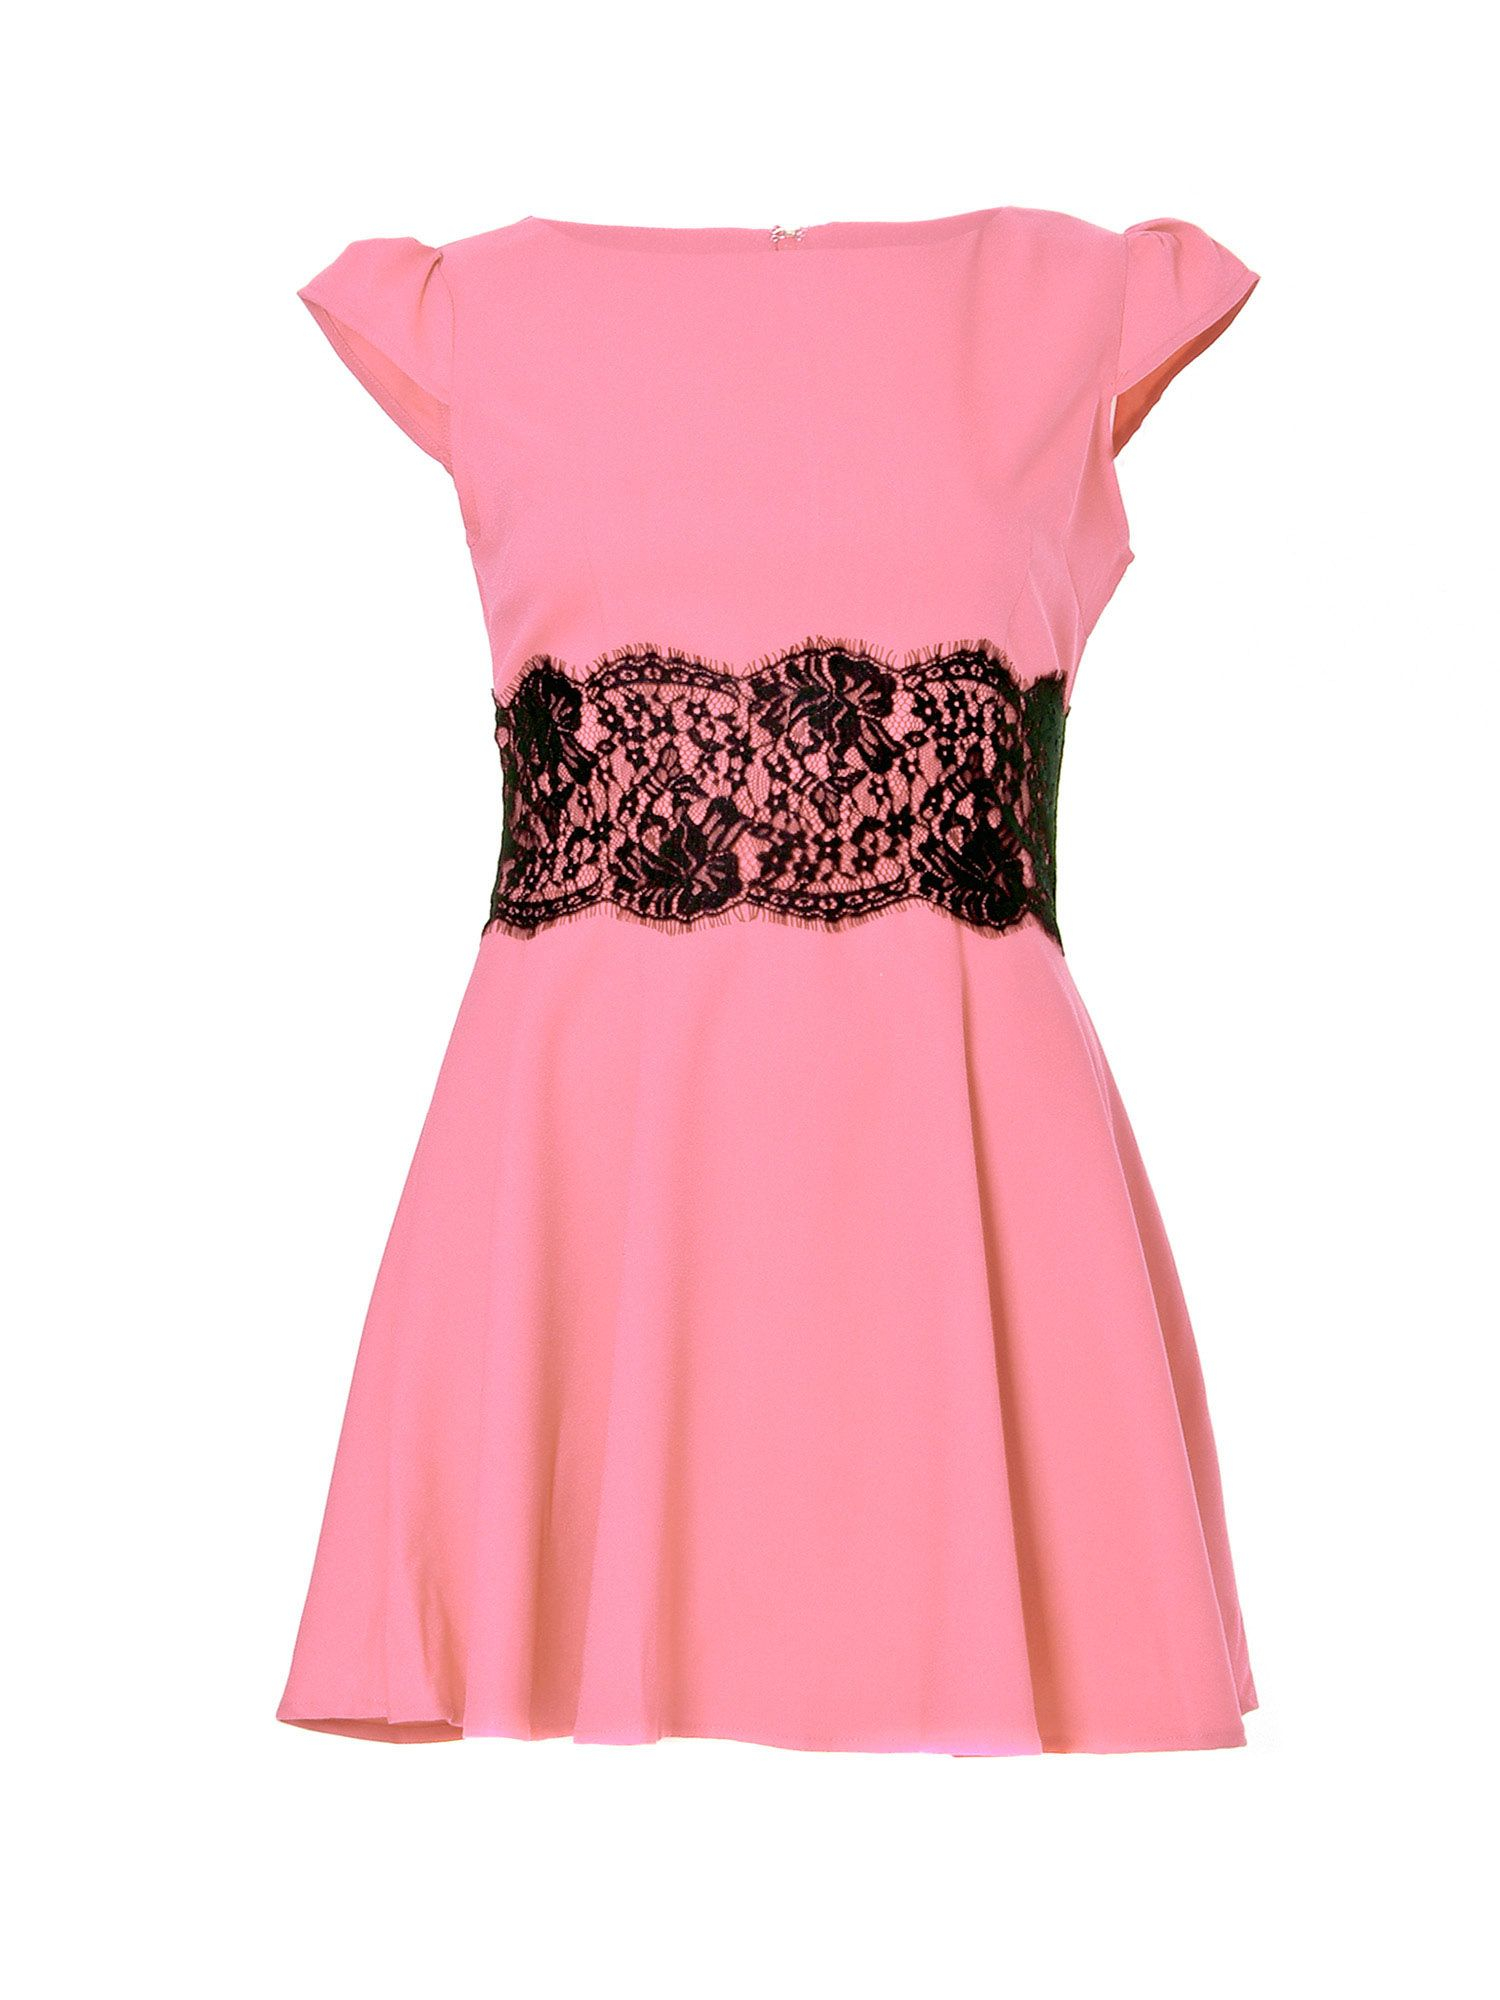 Very Cheap Ax Paris Pink Lace Waist Skater Dress - Pink AX PARIS Free Shipping Discounts F2ns1EWTK